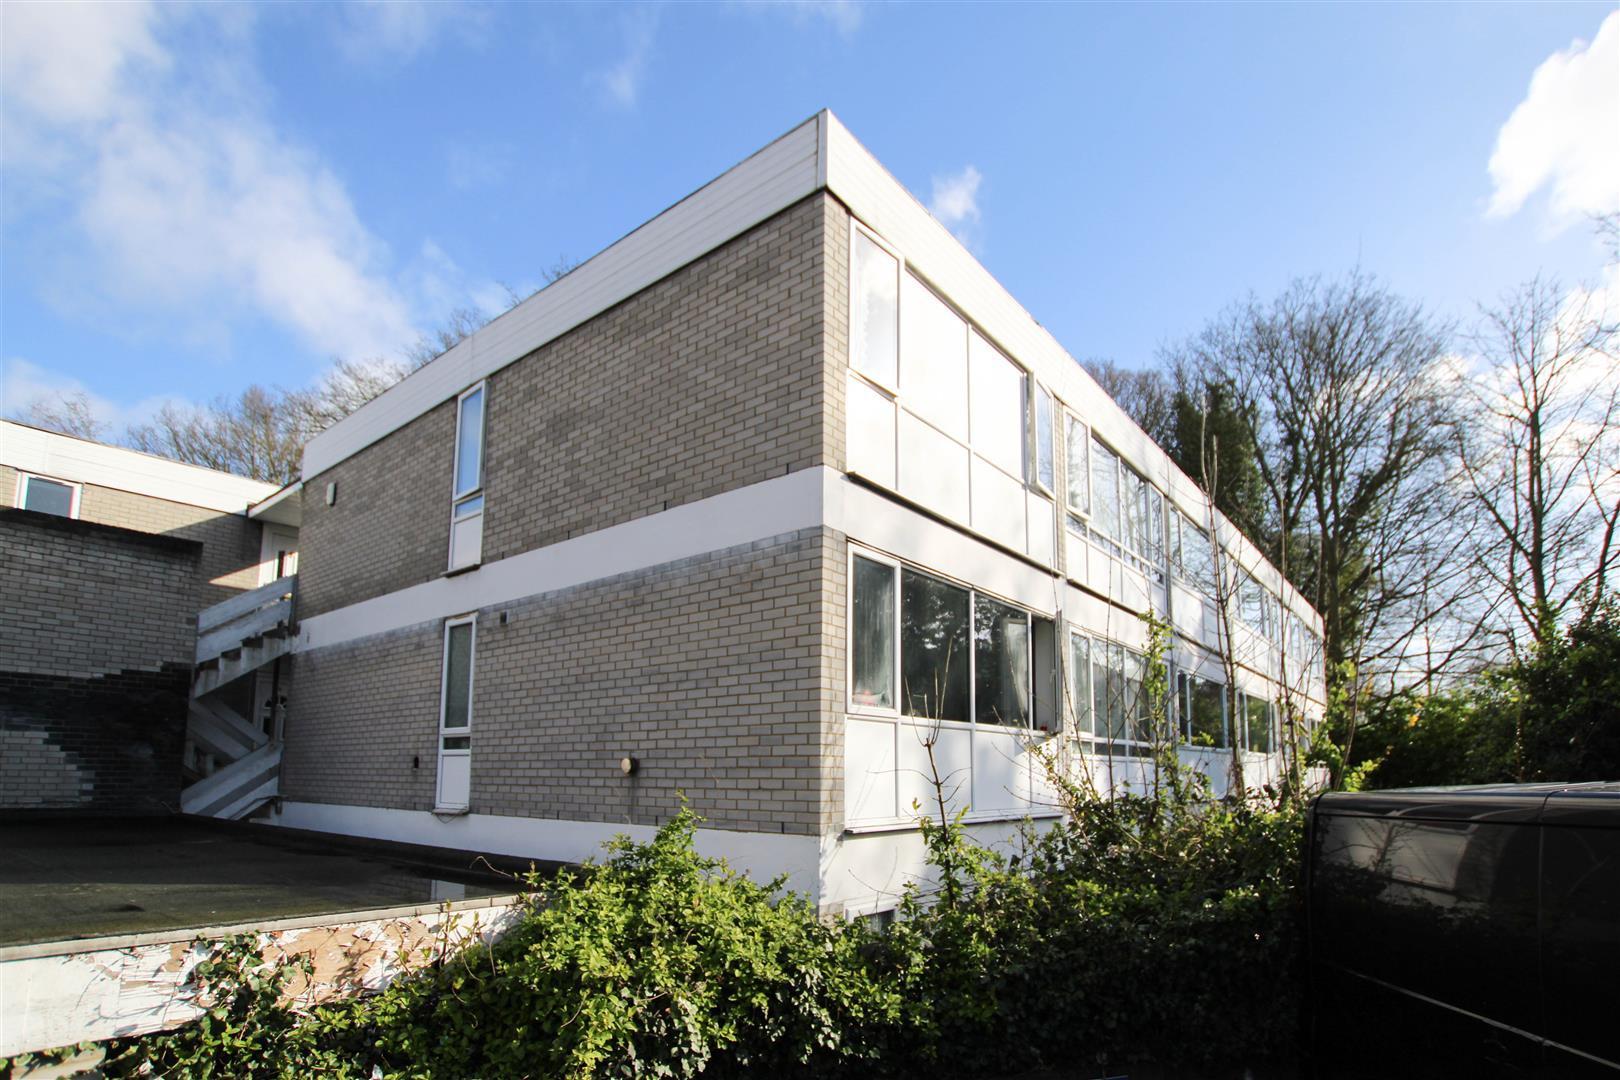 Cameron Close, Warley, Brentwood